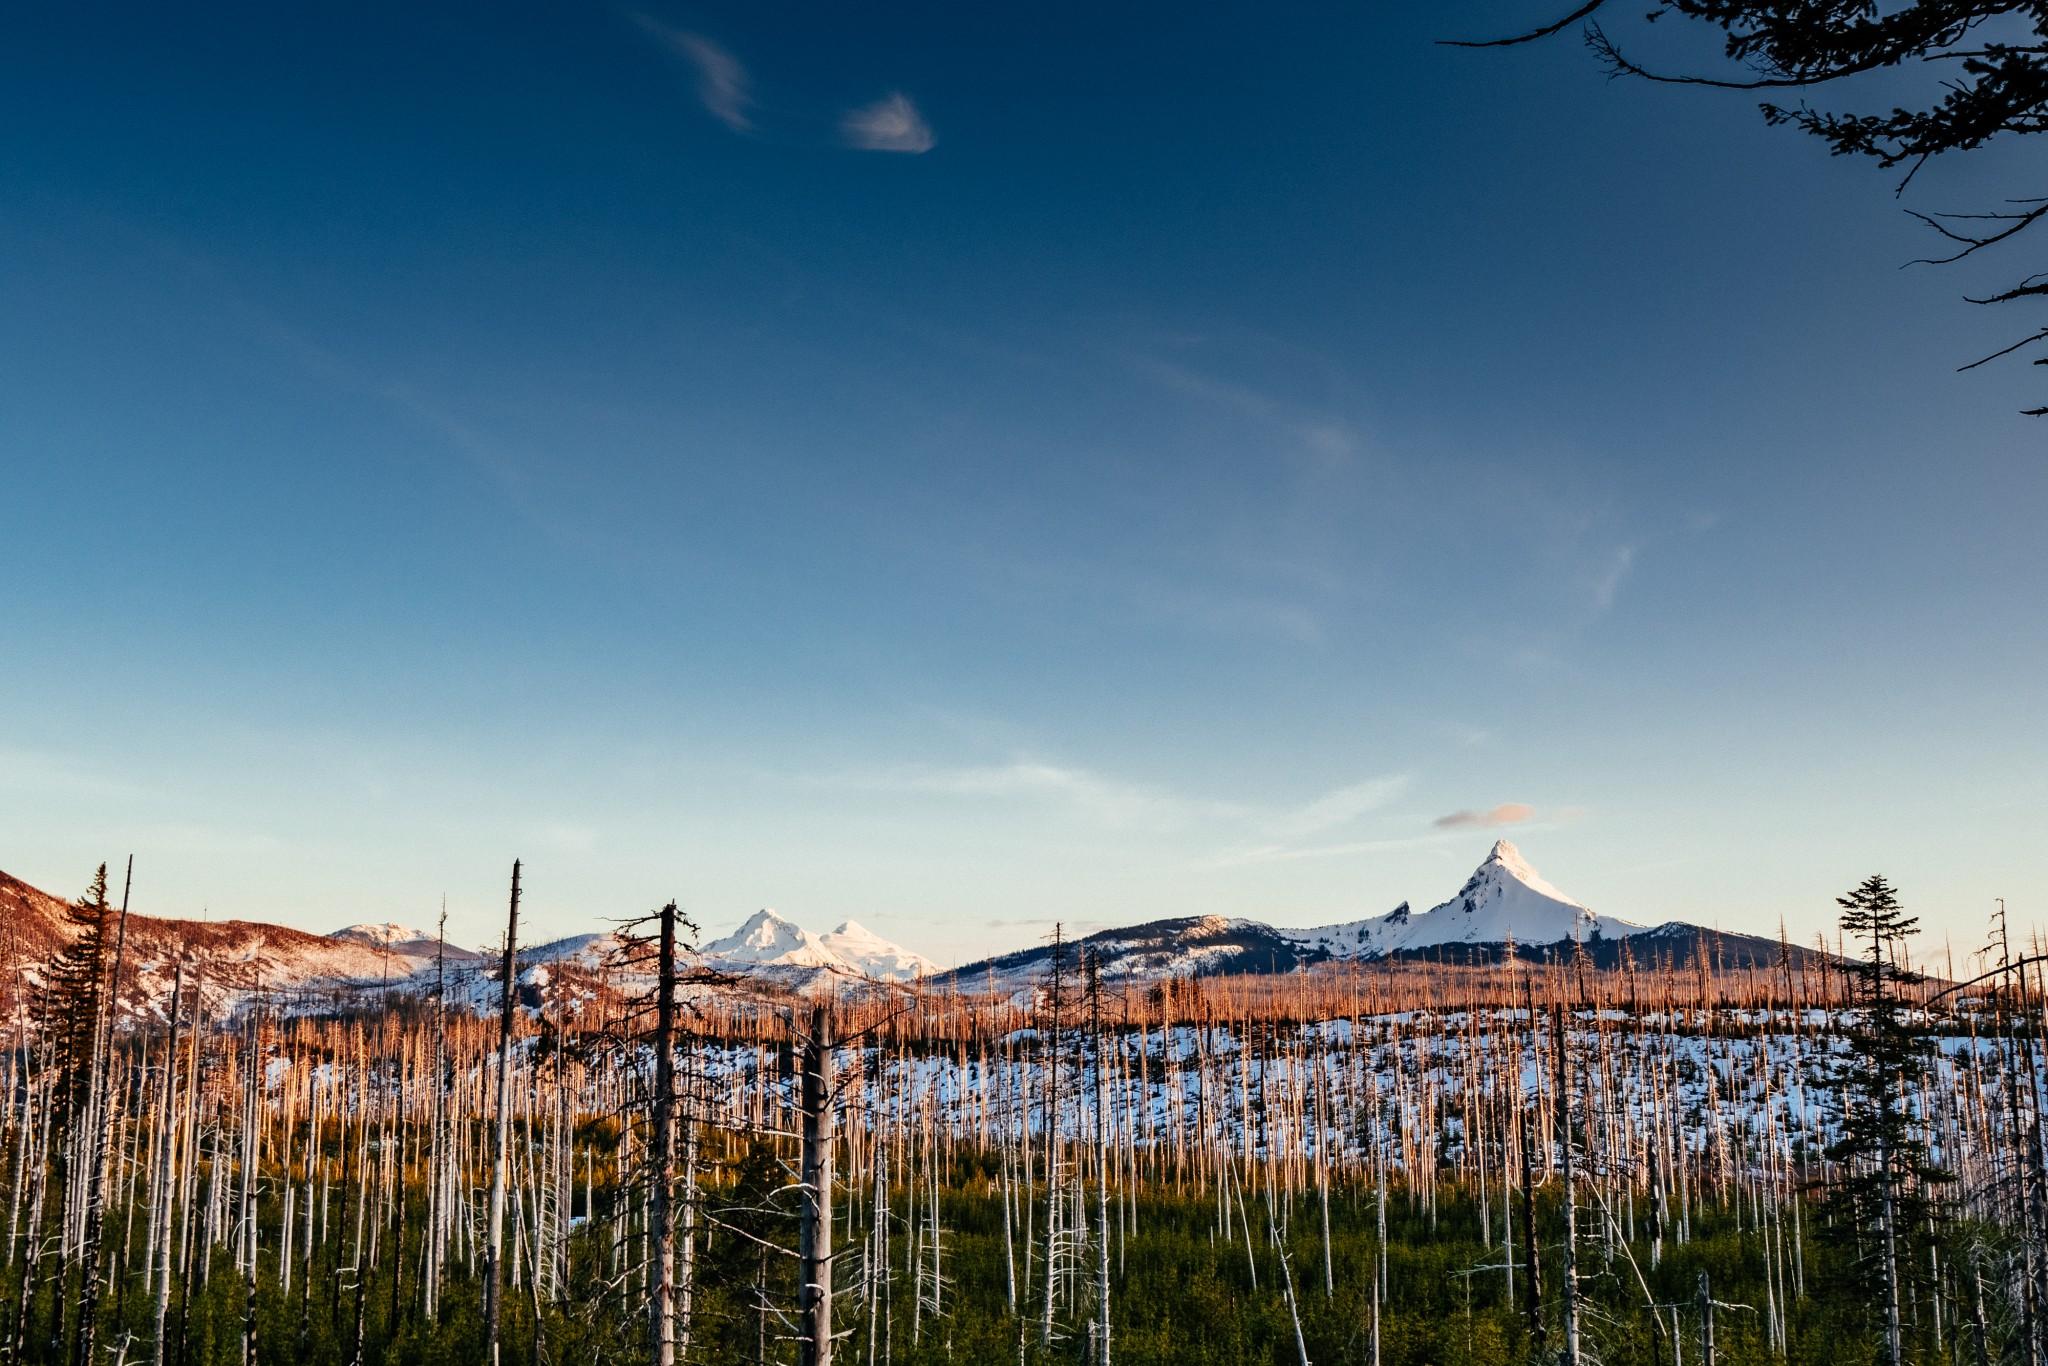 Mt.-Washington-and-Two-Sisters.jpg